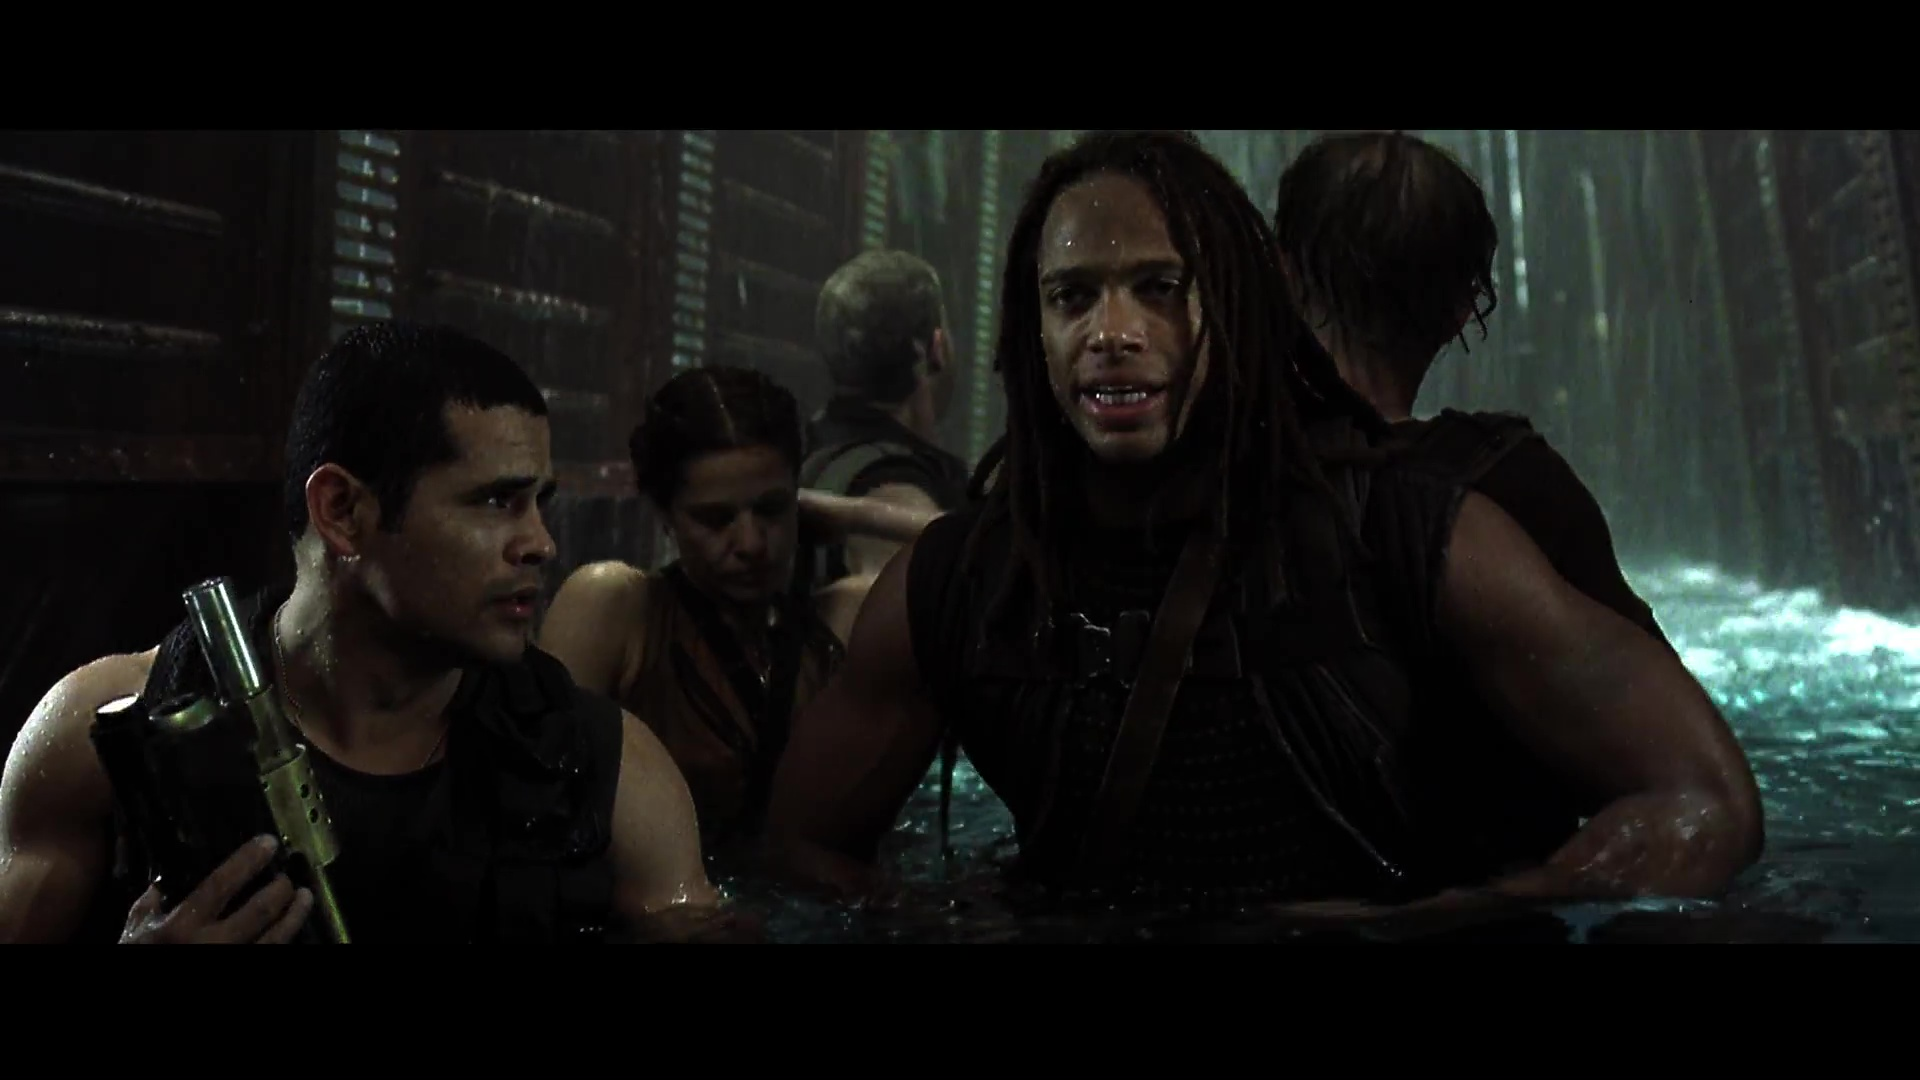 Alien 4 La Resurreccion 1080p Lat-Cast-Ing 5.1 (1997)